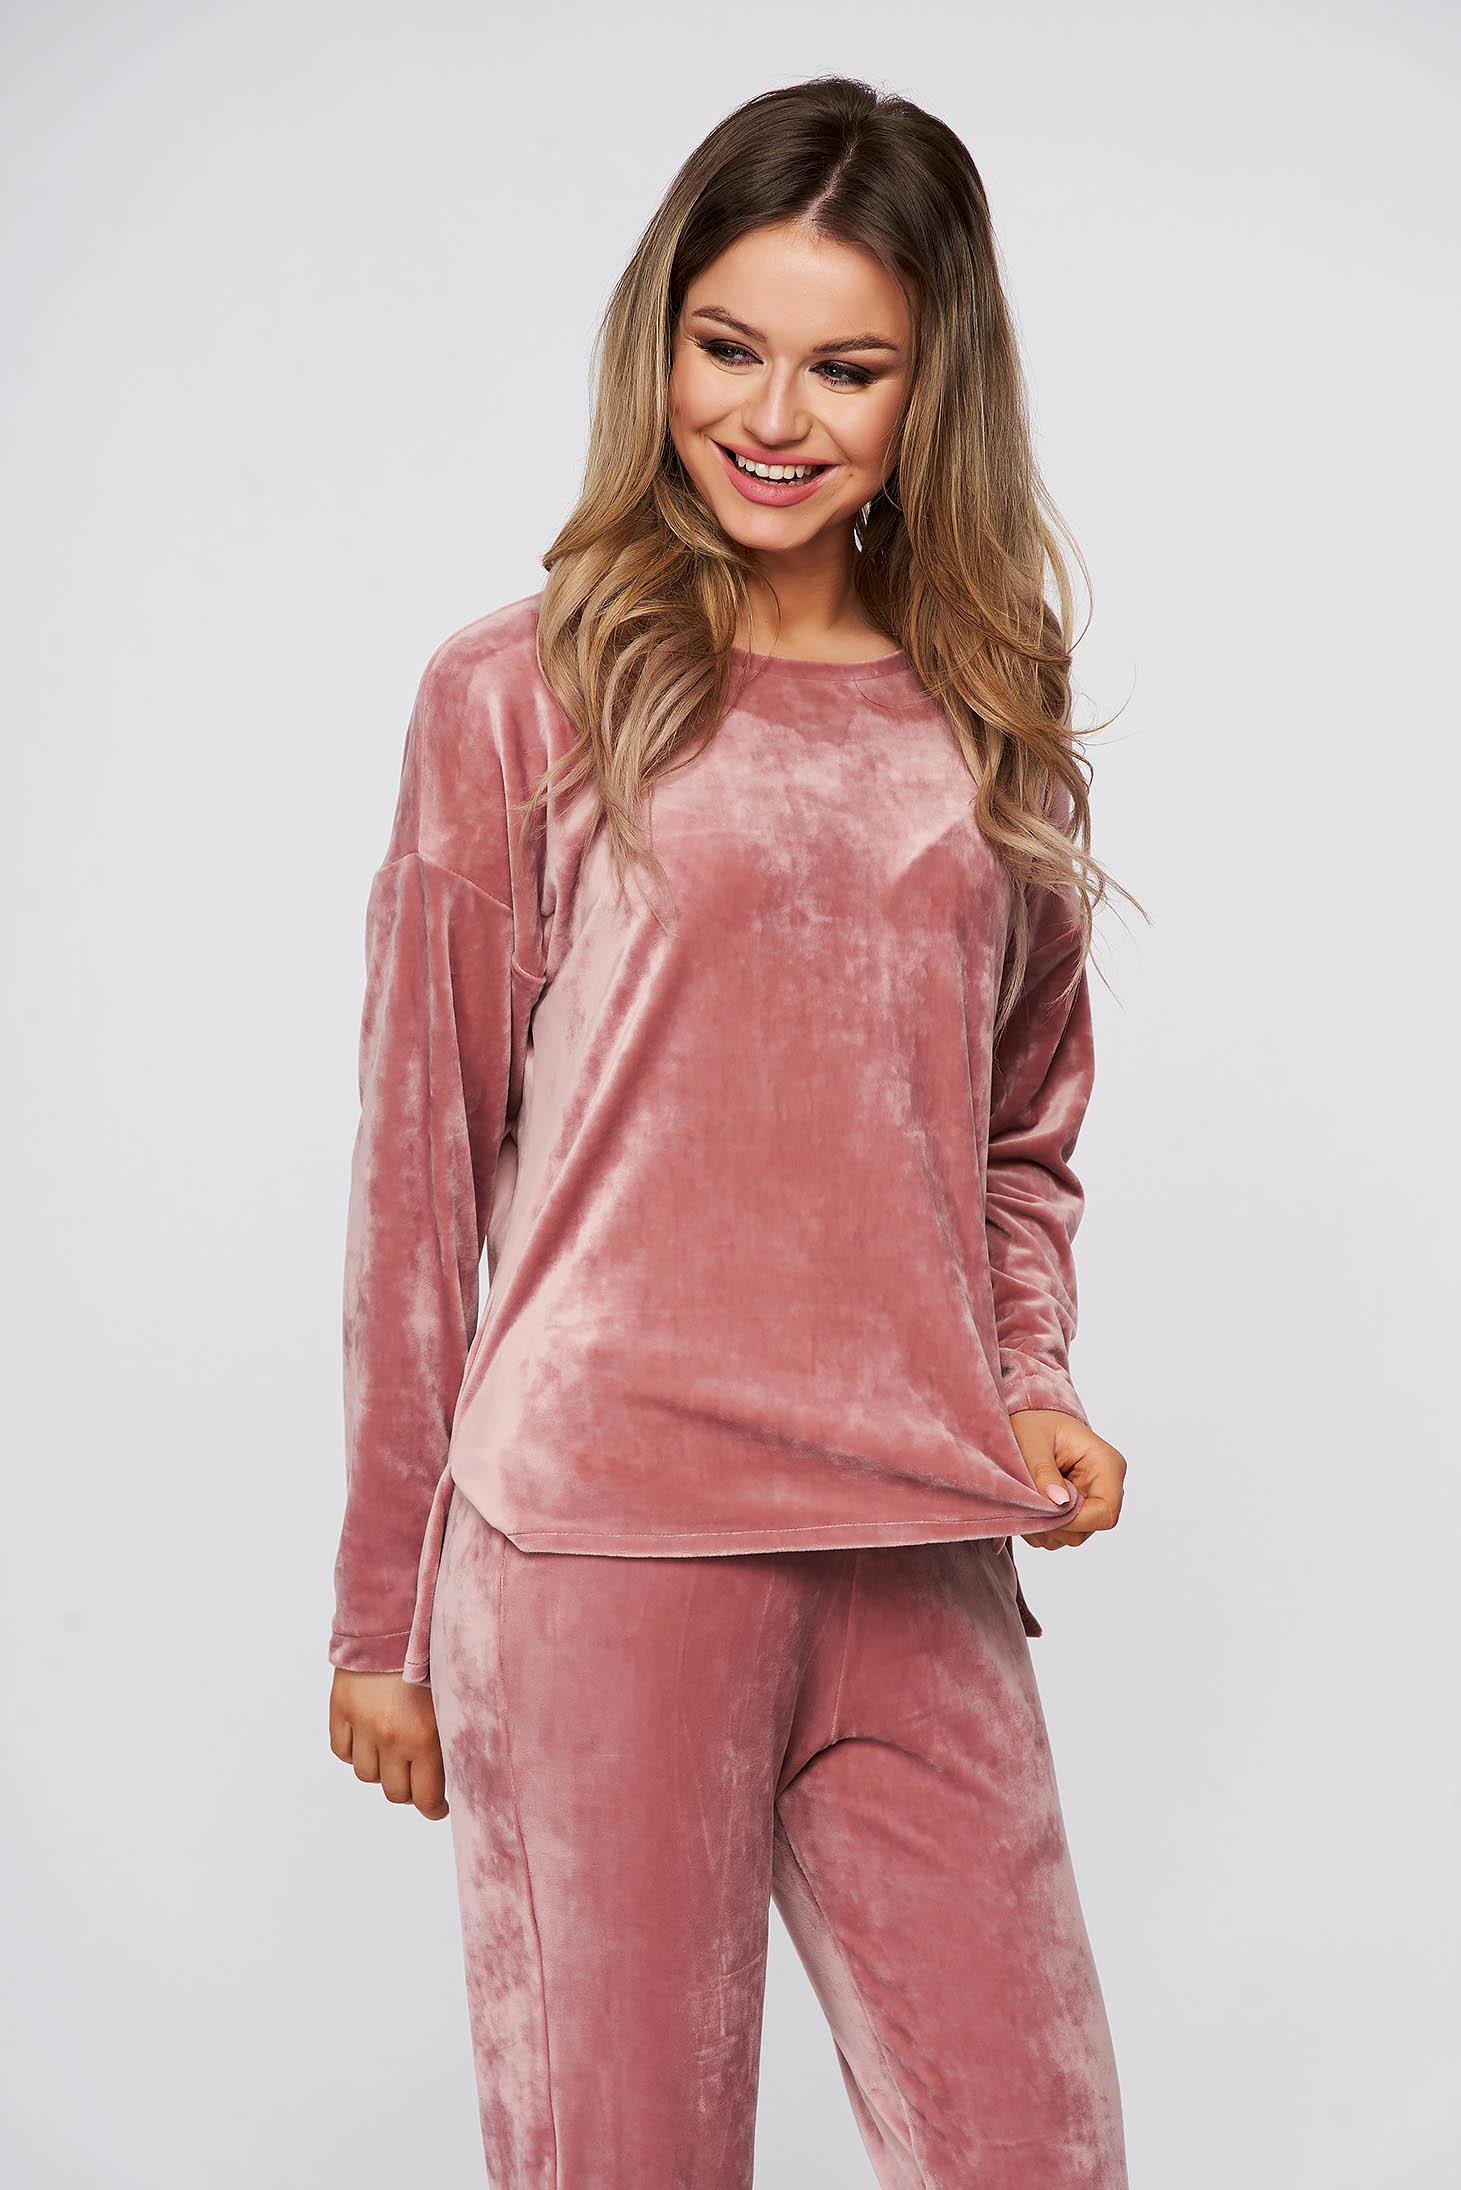 Trening StarShinerS roz prafuit din plus cu elastic in talie si bluza asimetrica